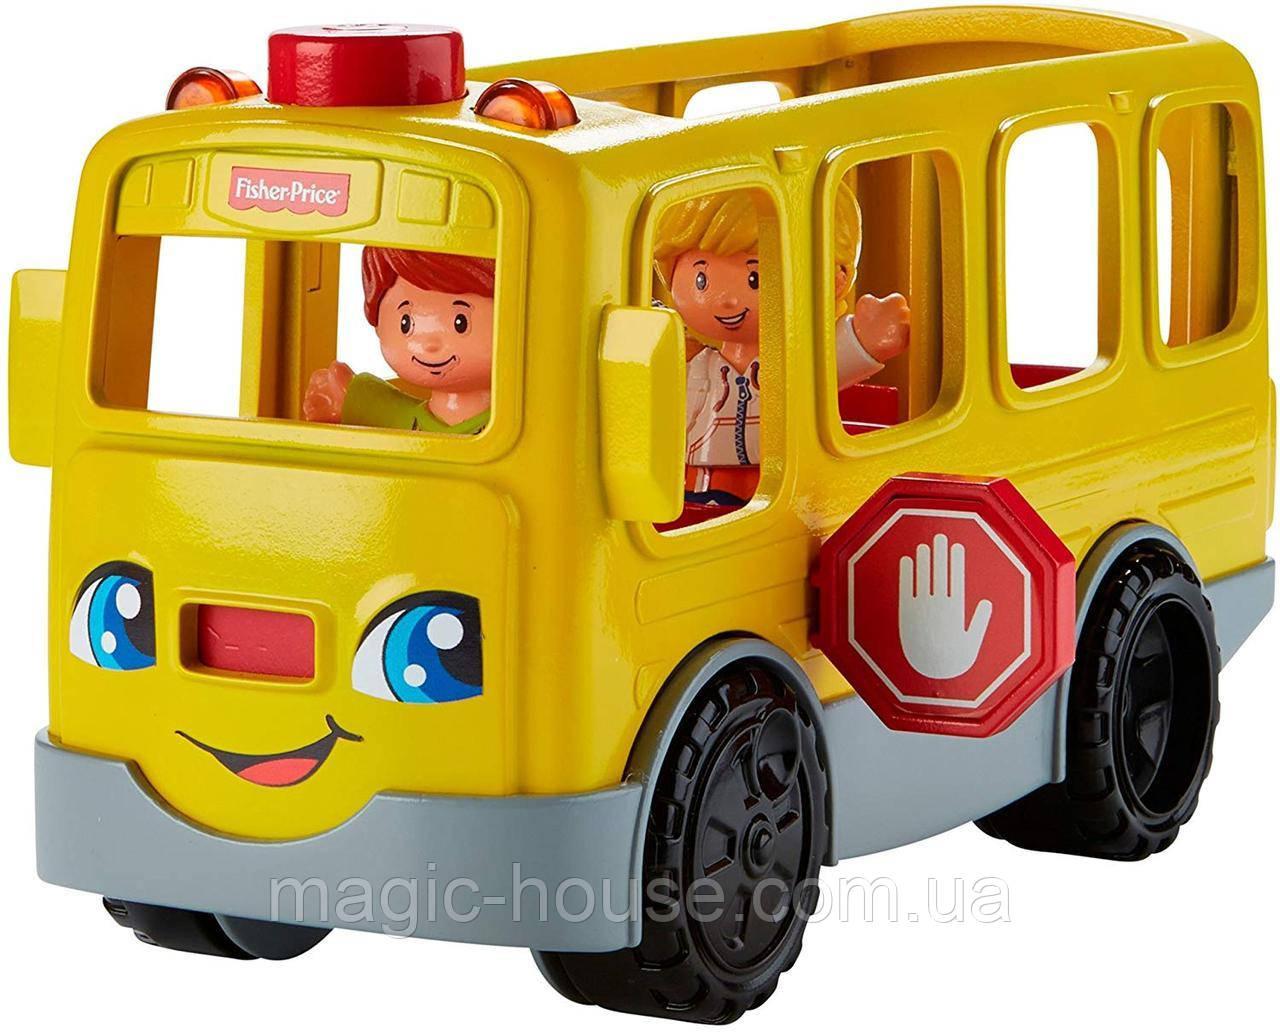 Школьный автобус Fisher Price Little People Sit with Me School Bus Vehicle